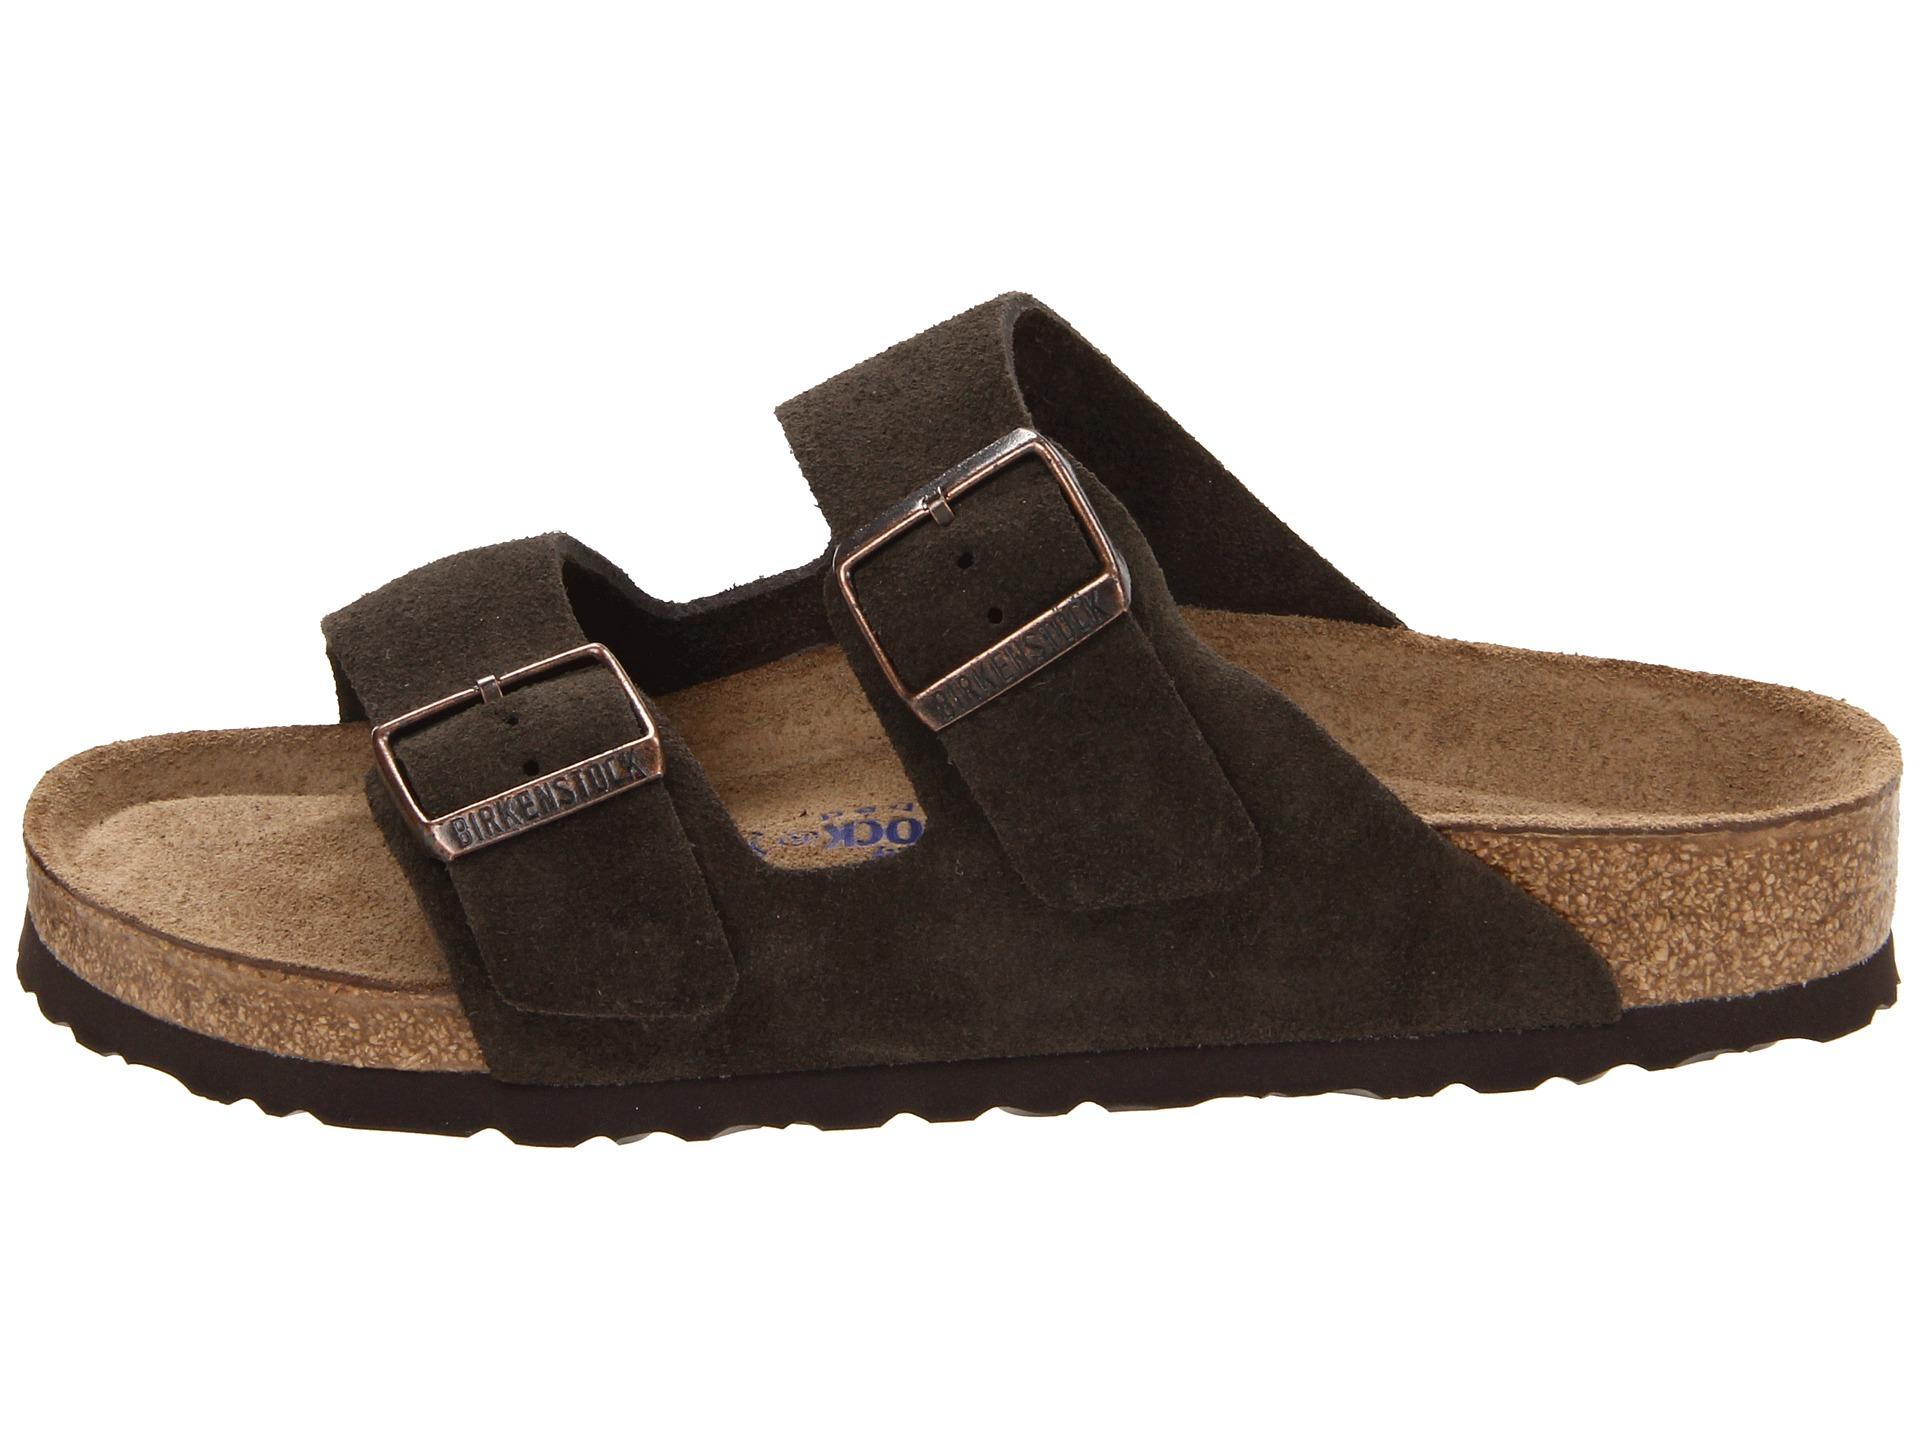 ab5ab08e9dd9 Birkenstock Florida Soft Footbed Nubuck Slippers Rubber